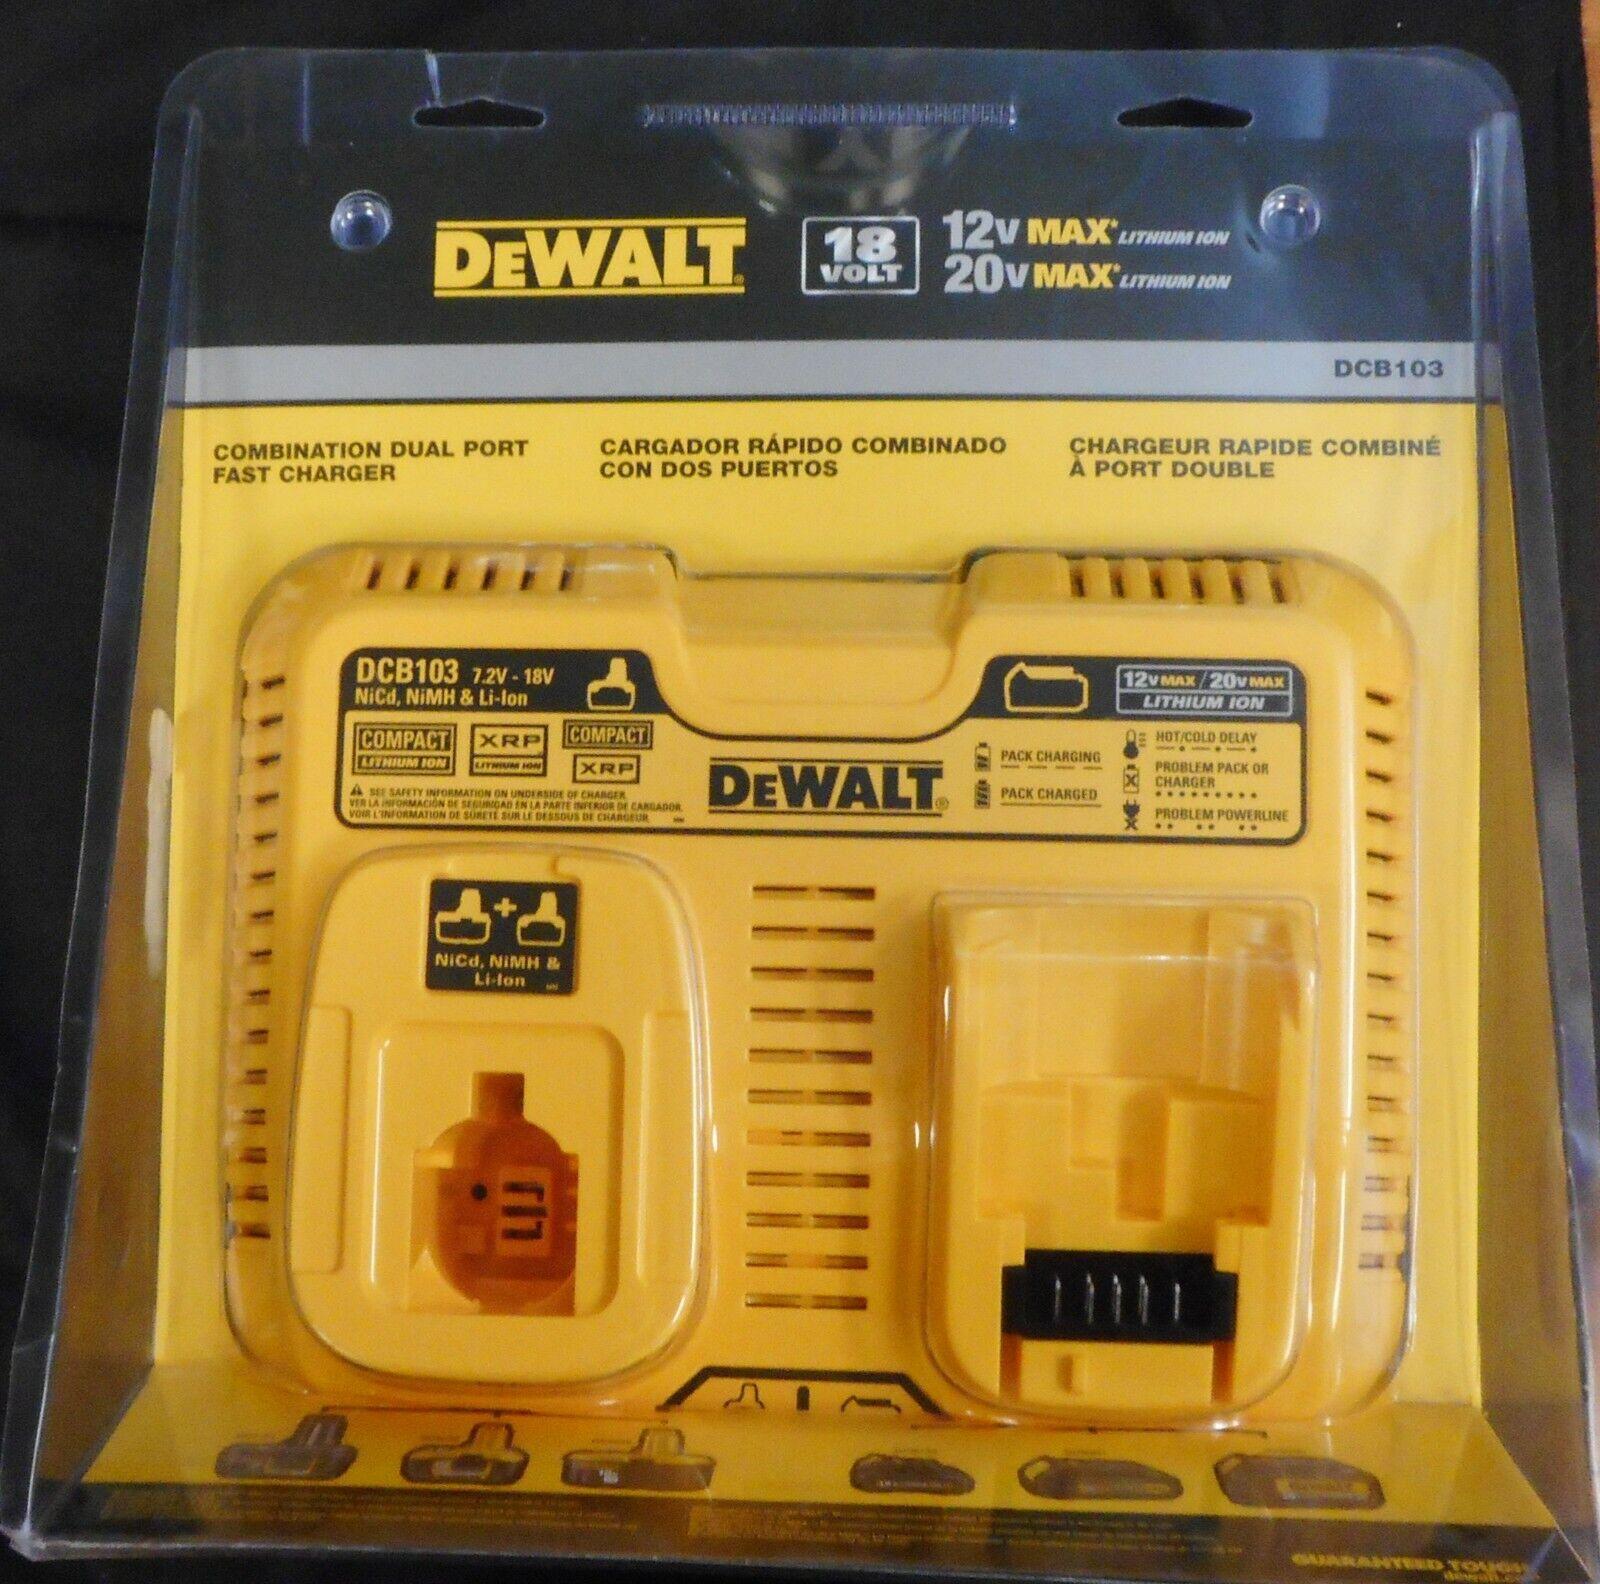 DEWALT-DCB103 Combination Li-Ion/NiCd Dual Port Fast Charger